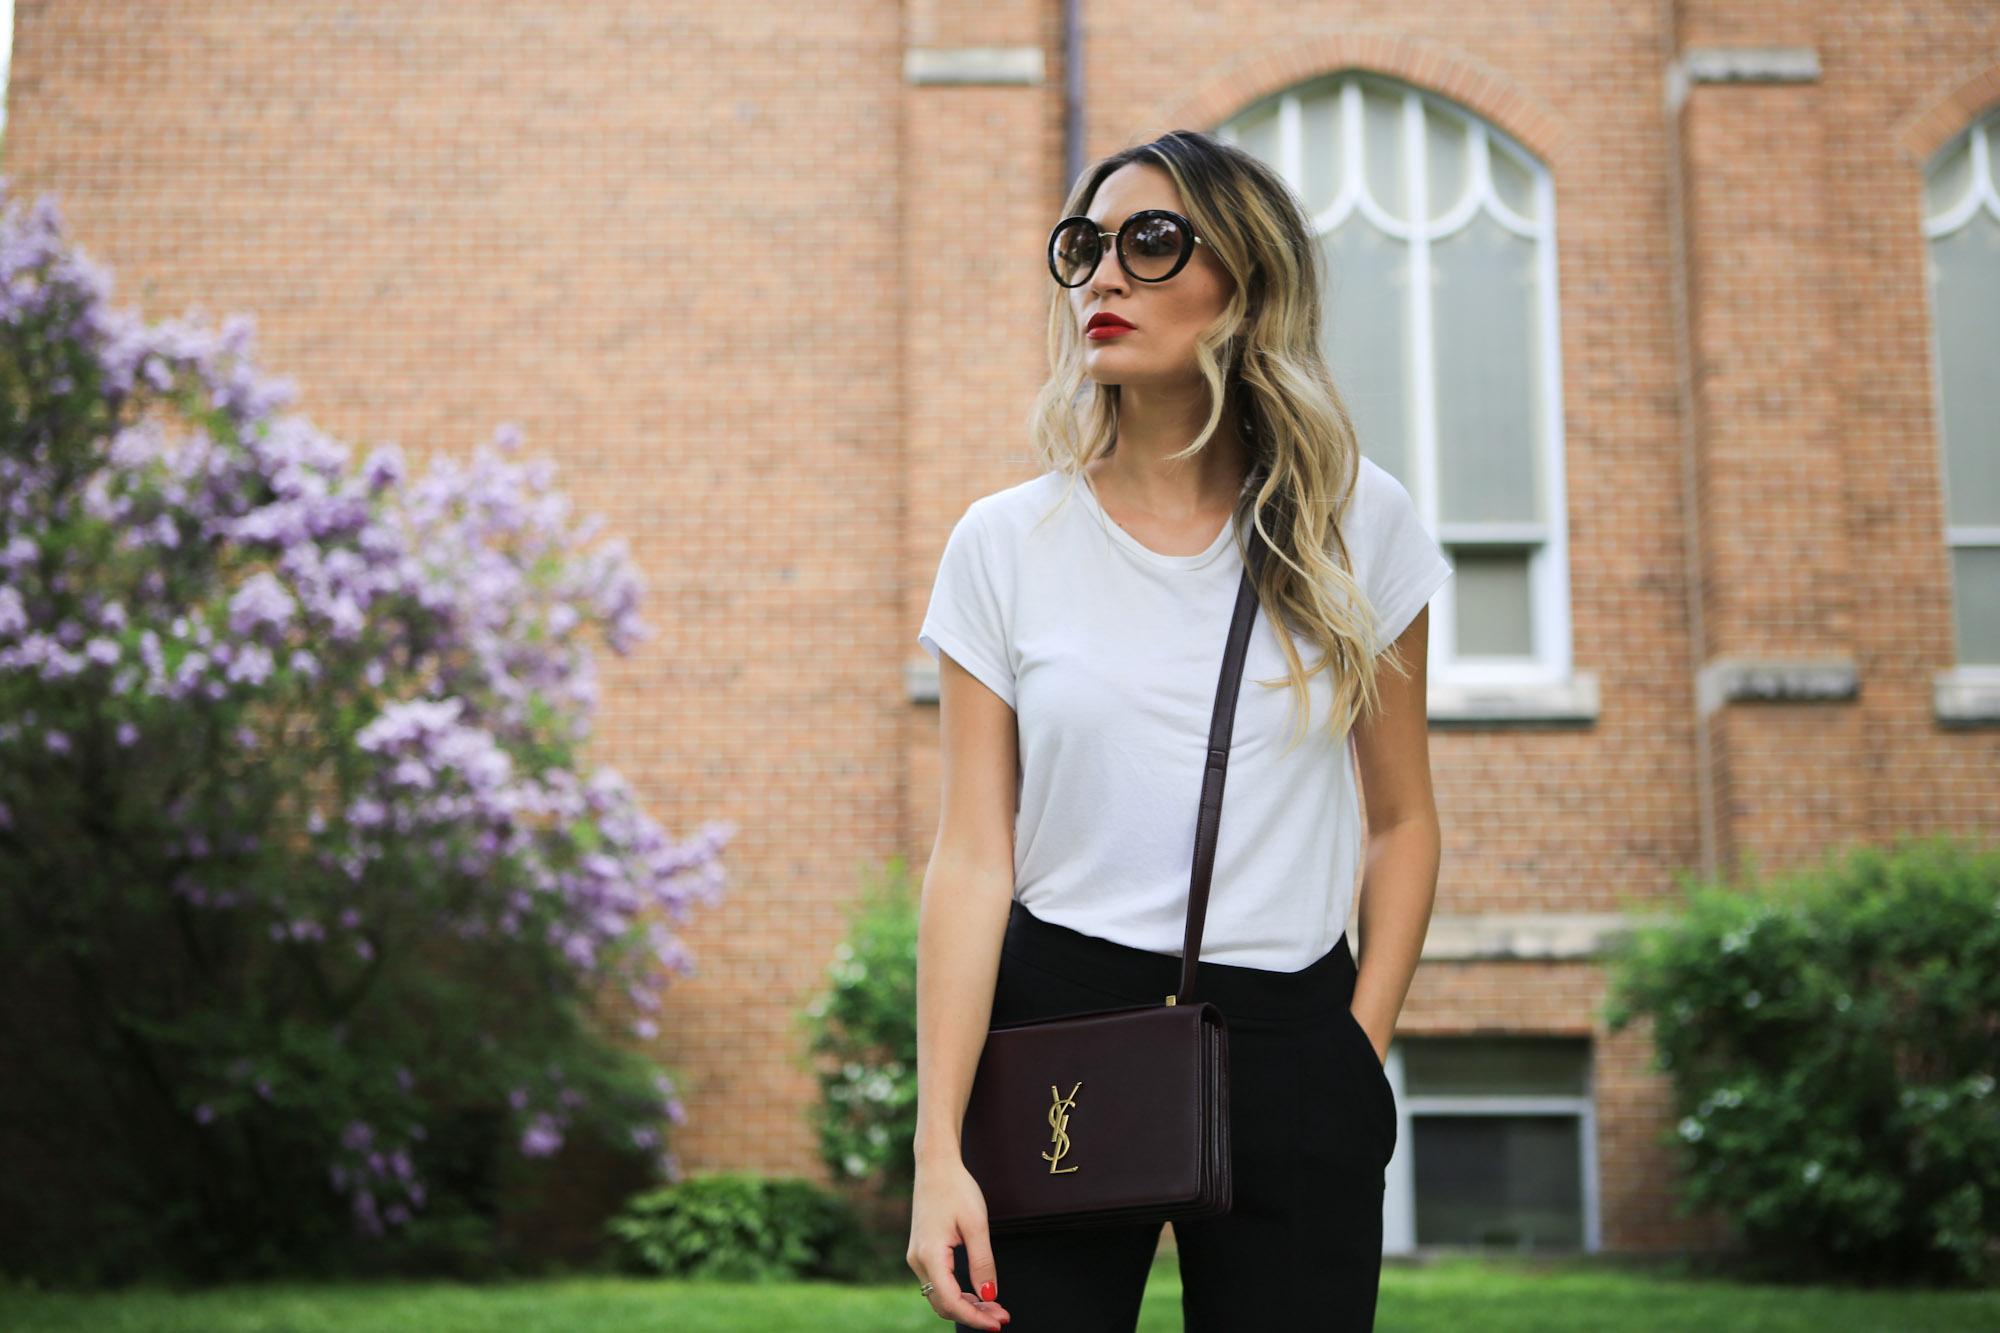 DETAILS - Sunglasses - PradaLip - By Terry Click Stick #18T Shirt - ReformationBag - Saint LaurentTrousers - Babaton